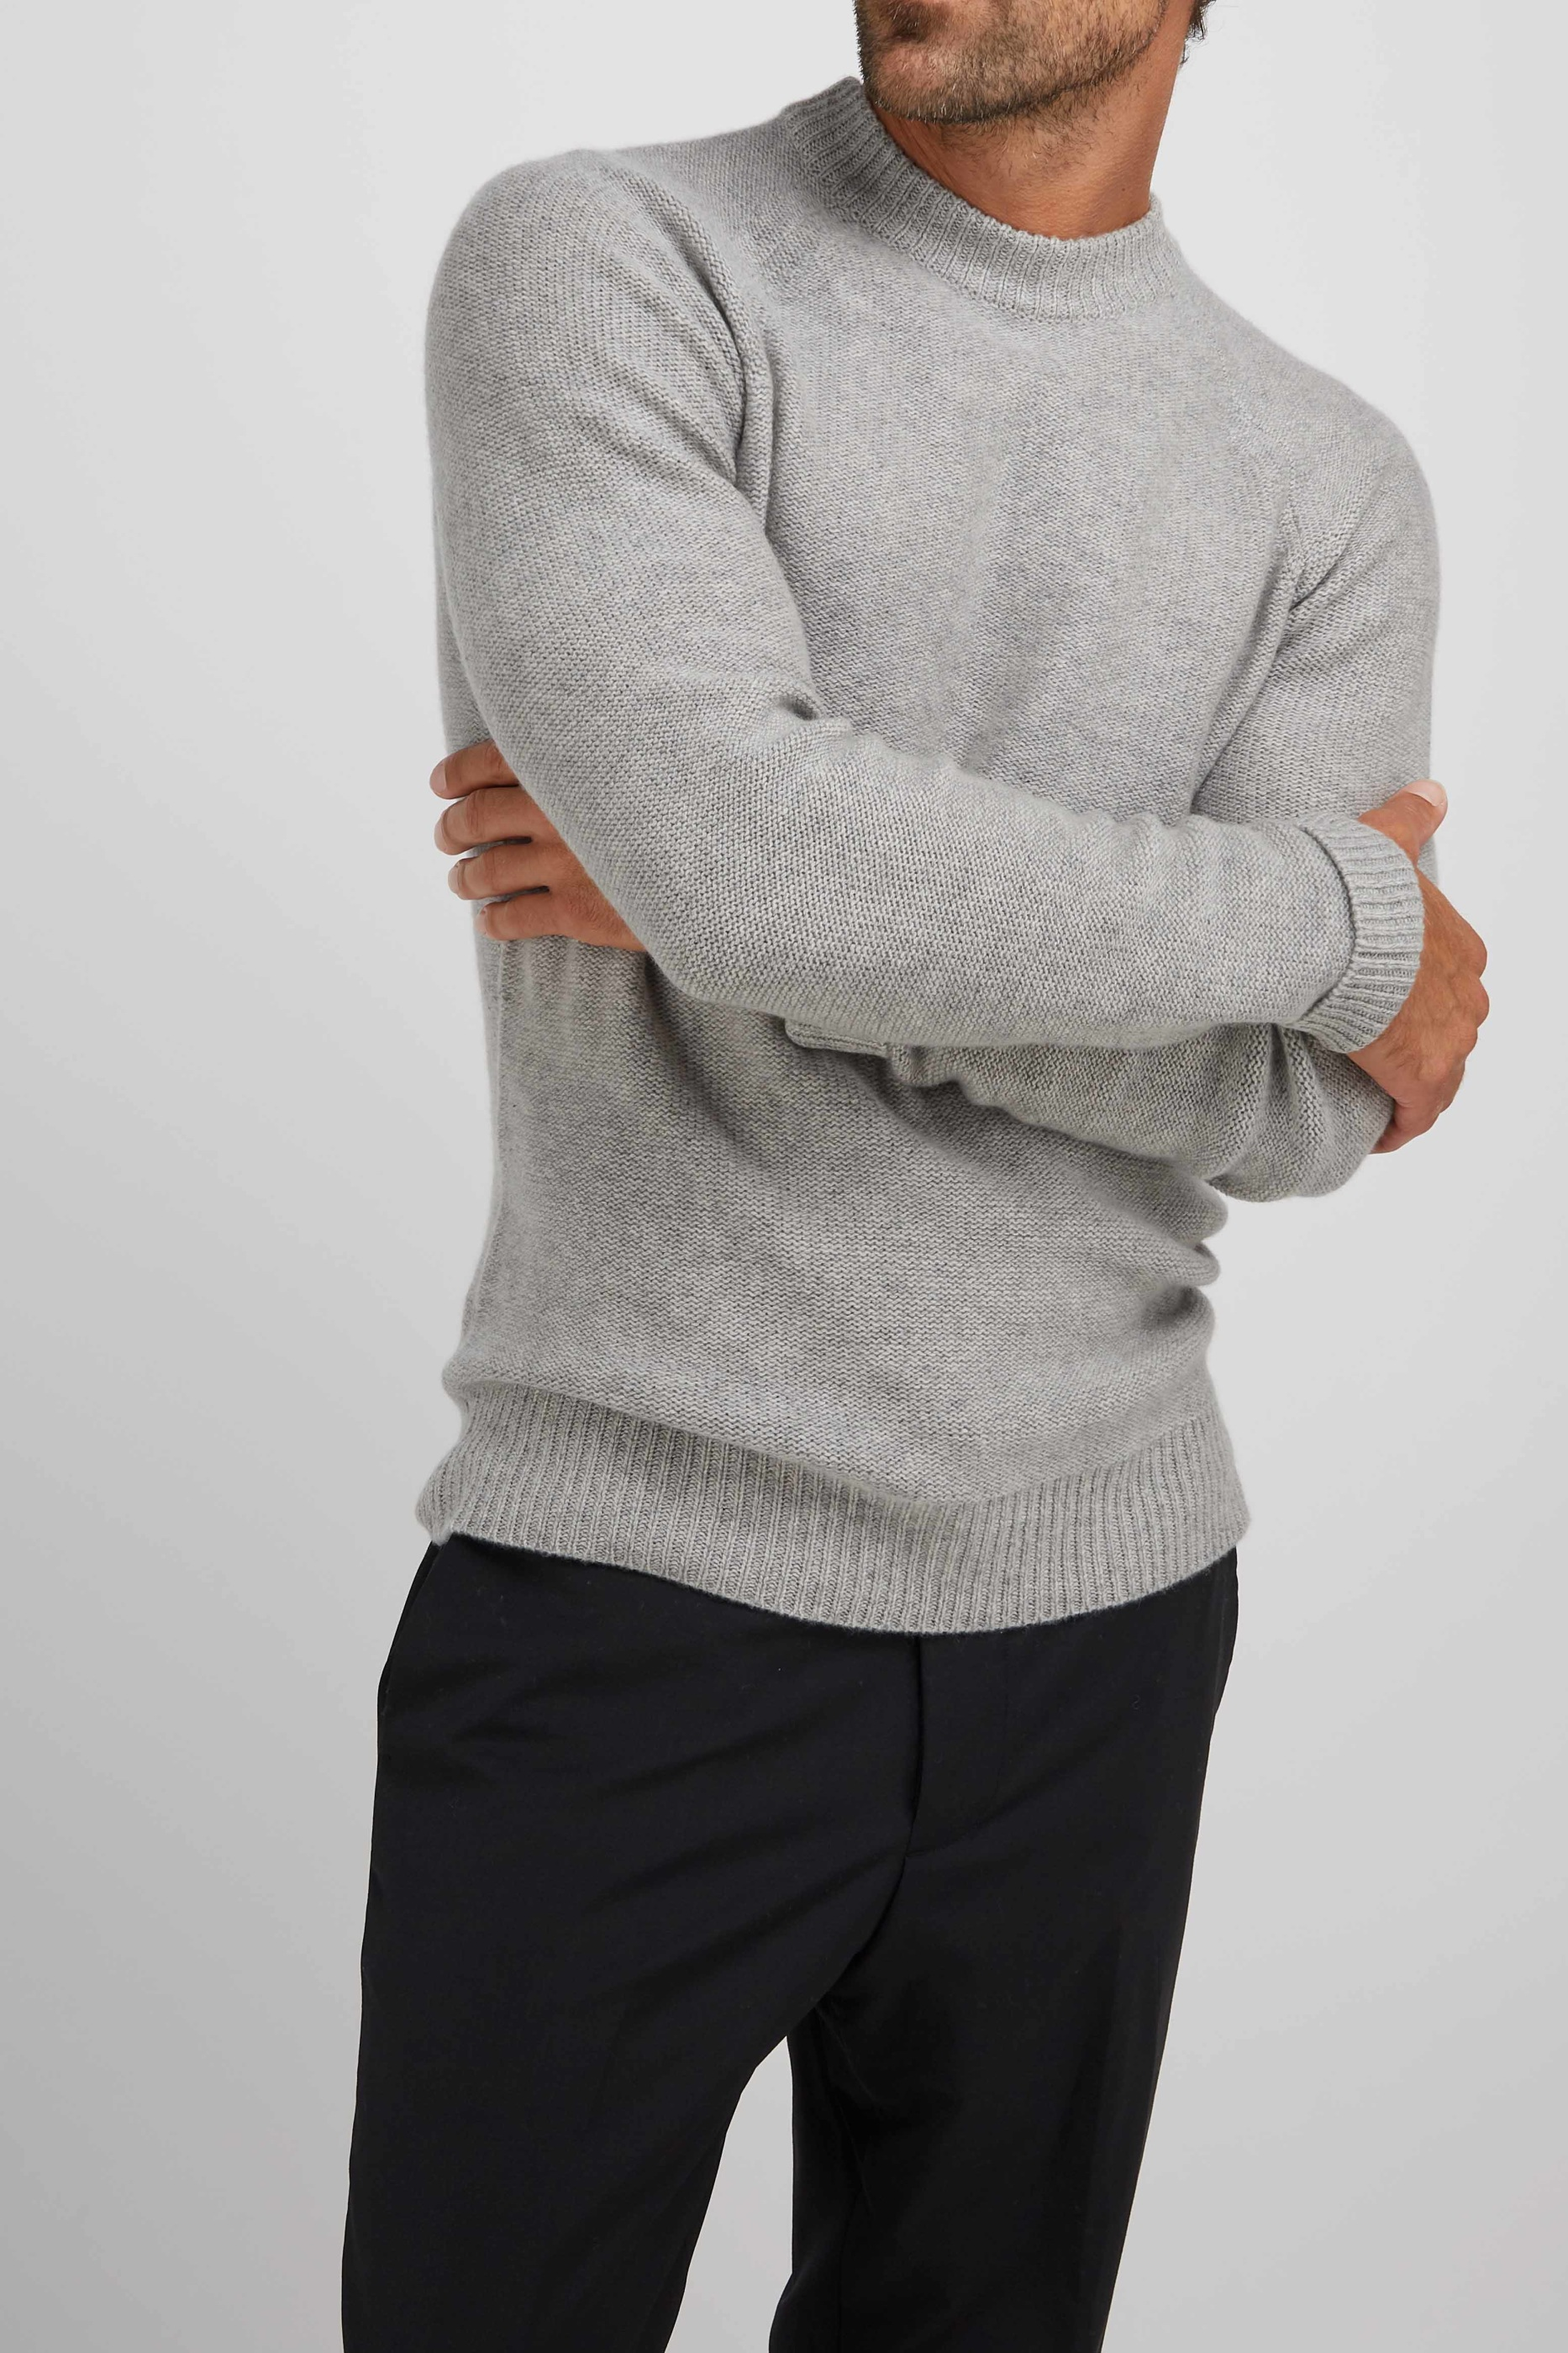 ManRaglanBoxSweater_LightGrey_3